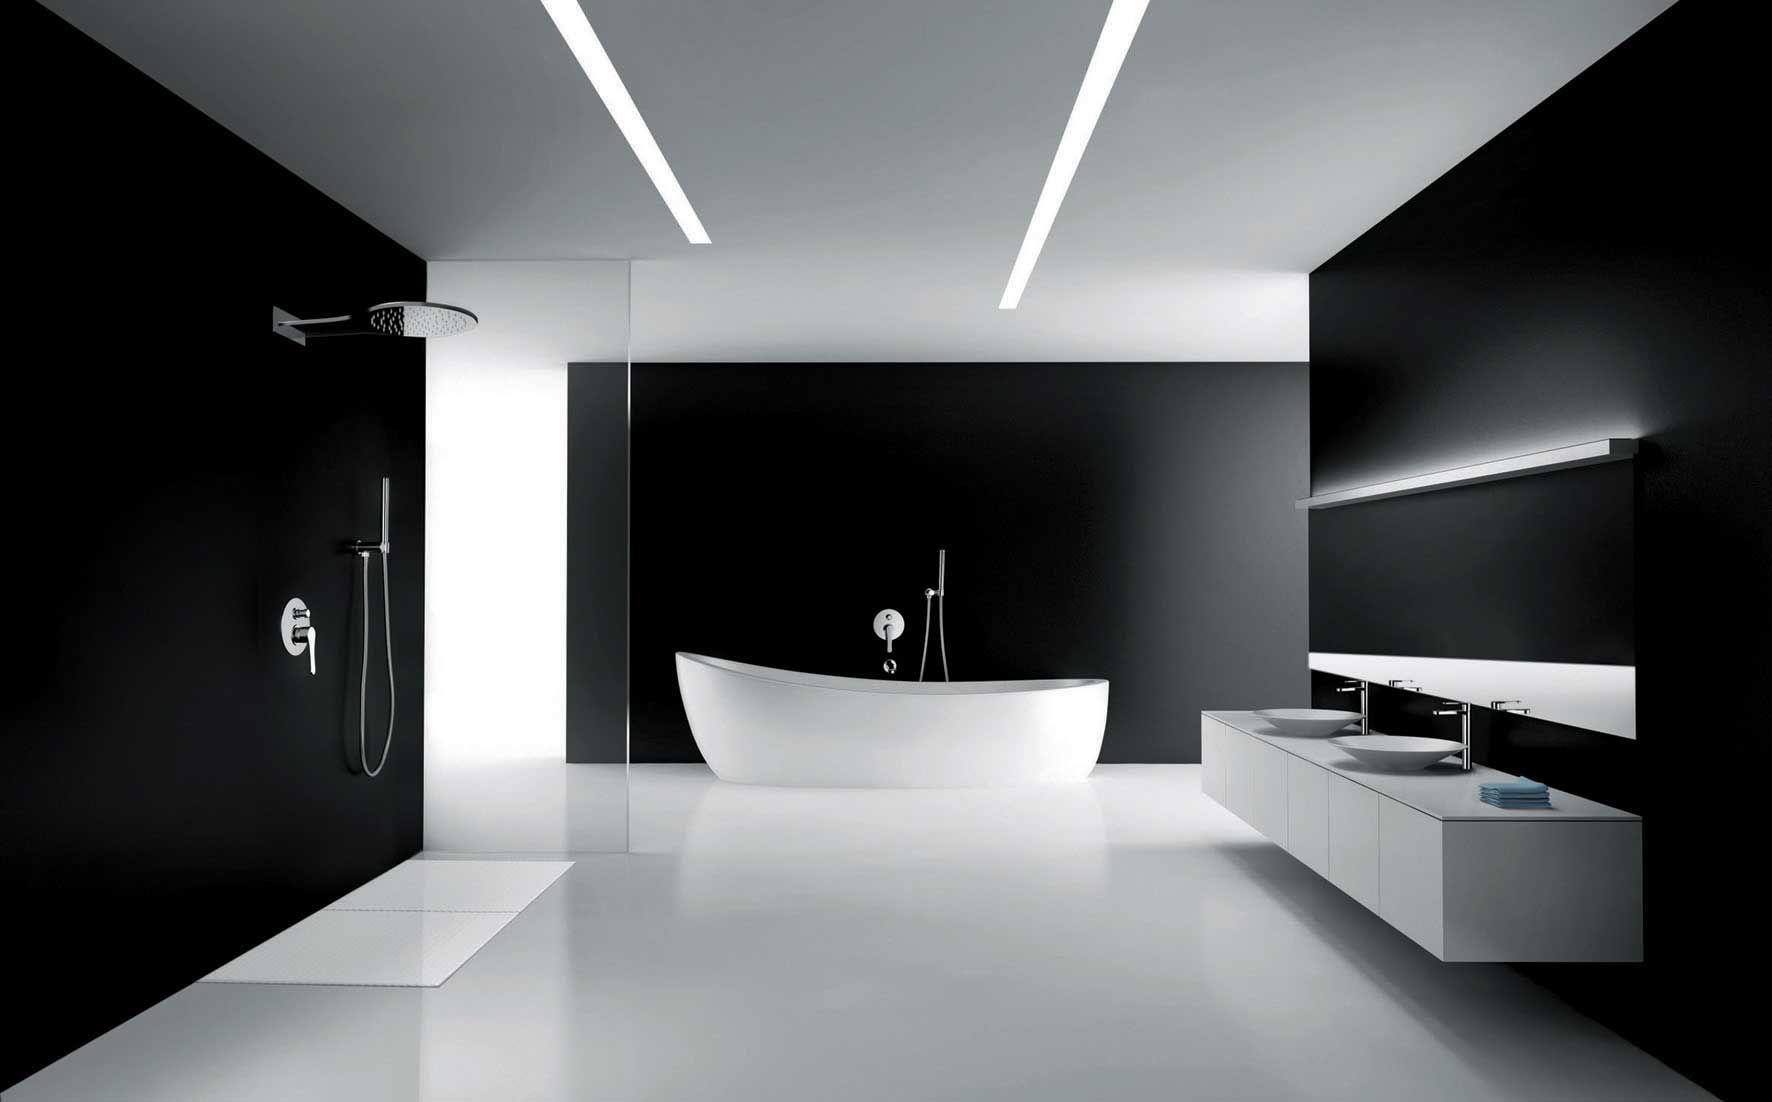 Boston Bathroom Remodeling Minimalist 25 minimalist bathroom design ideas | minimalism, minimalist